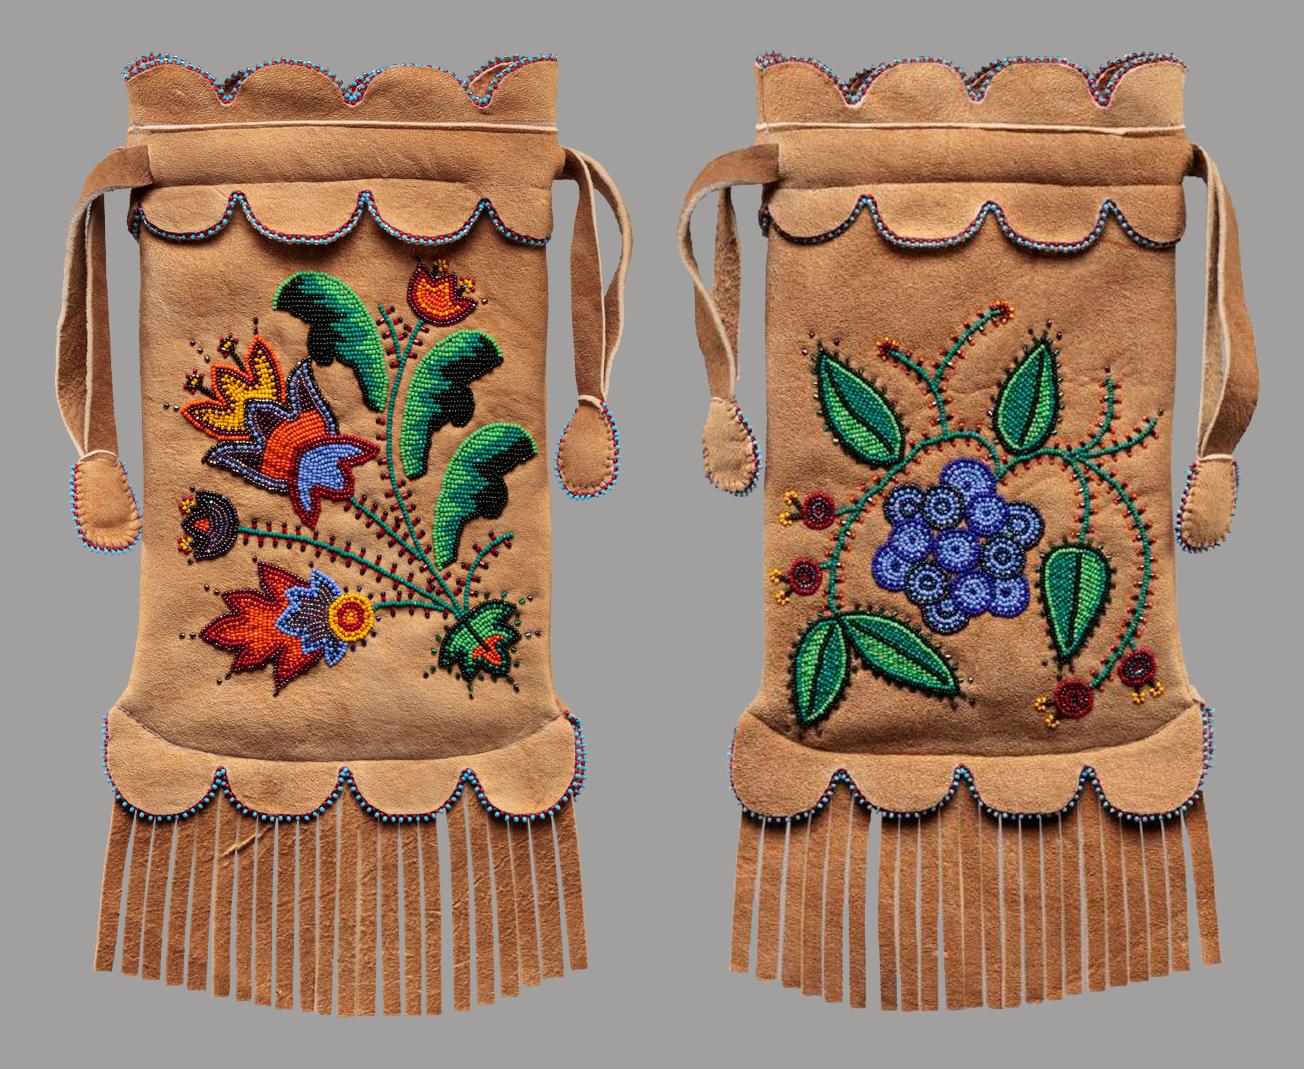 Anishinaabe Handbag (front and back)